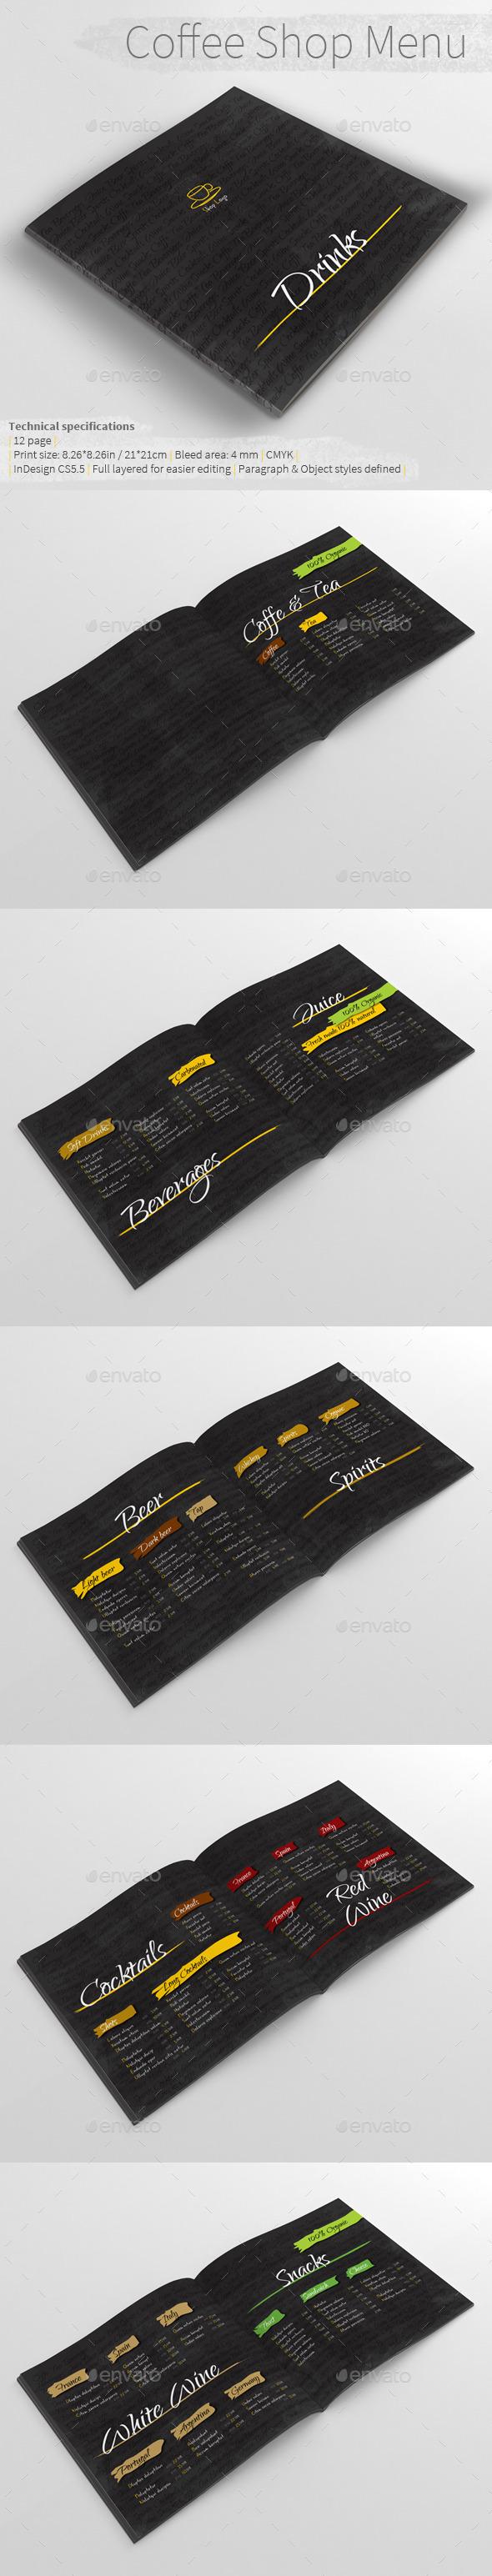 Coffee Shop Menu - Food Menus Print Templates